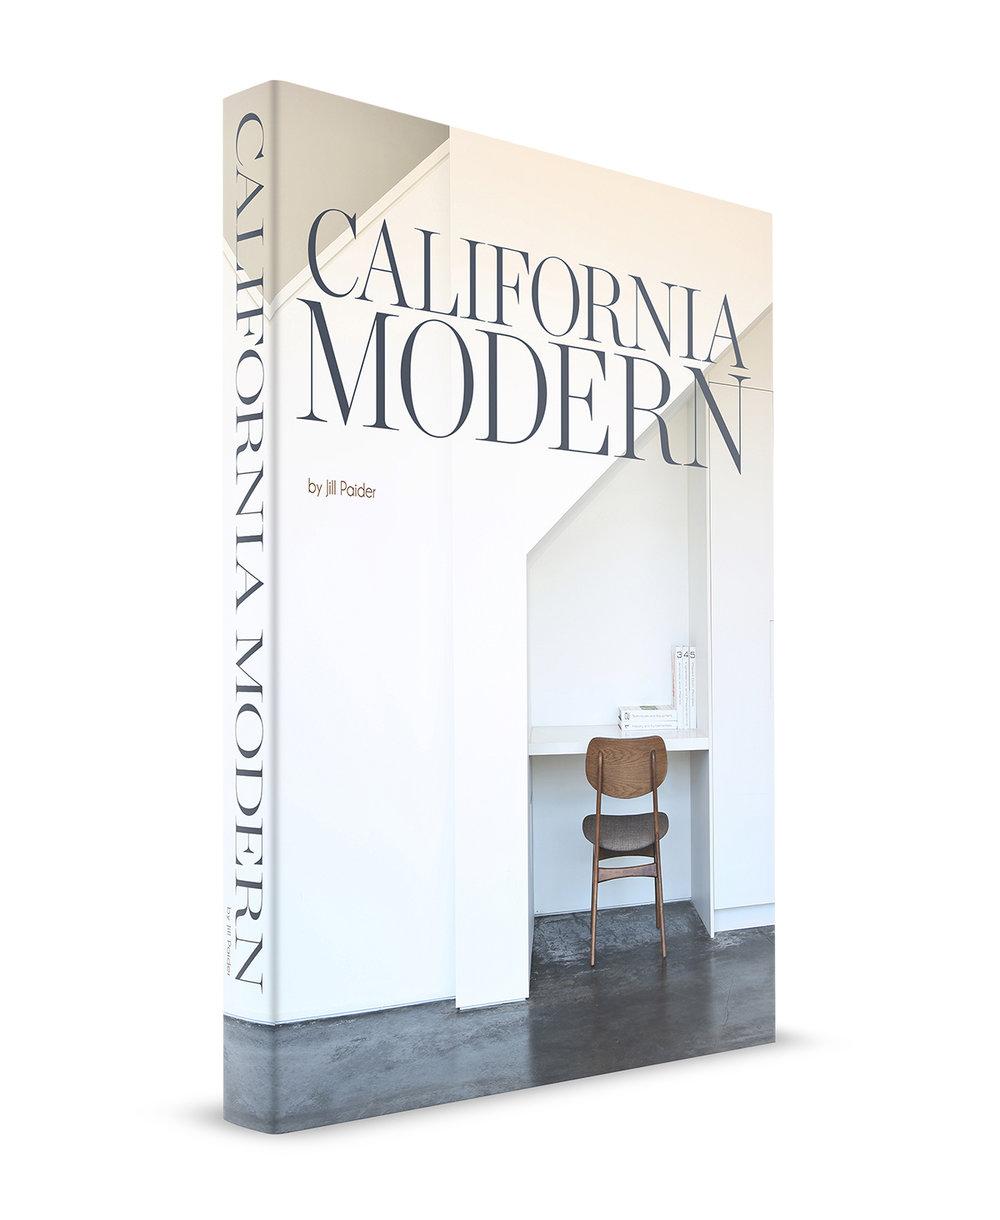 CALIFORNIA MODERN